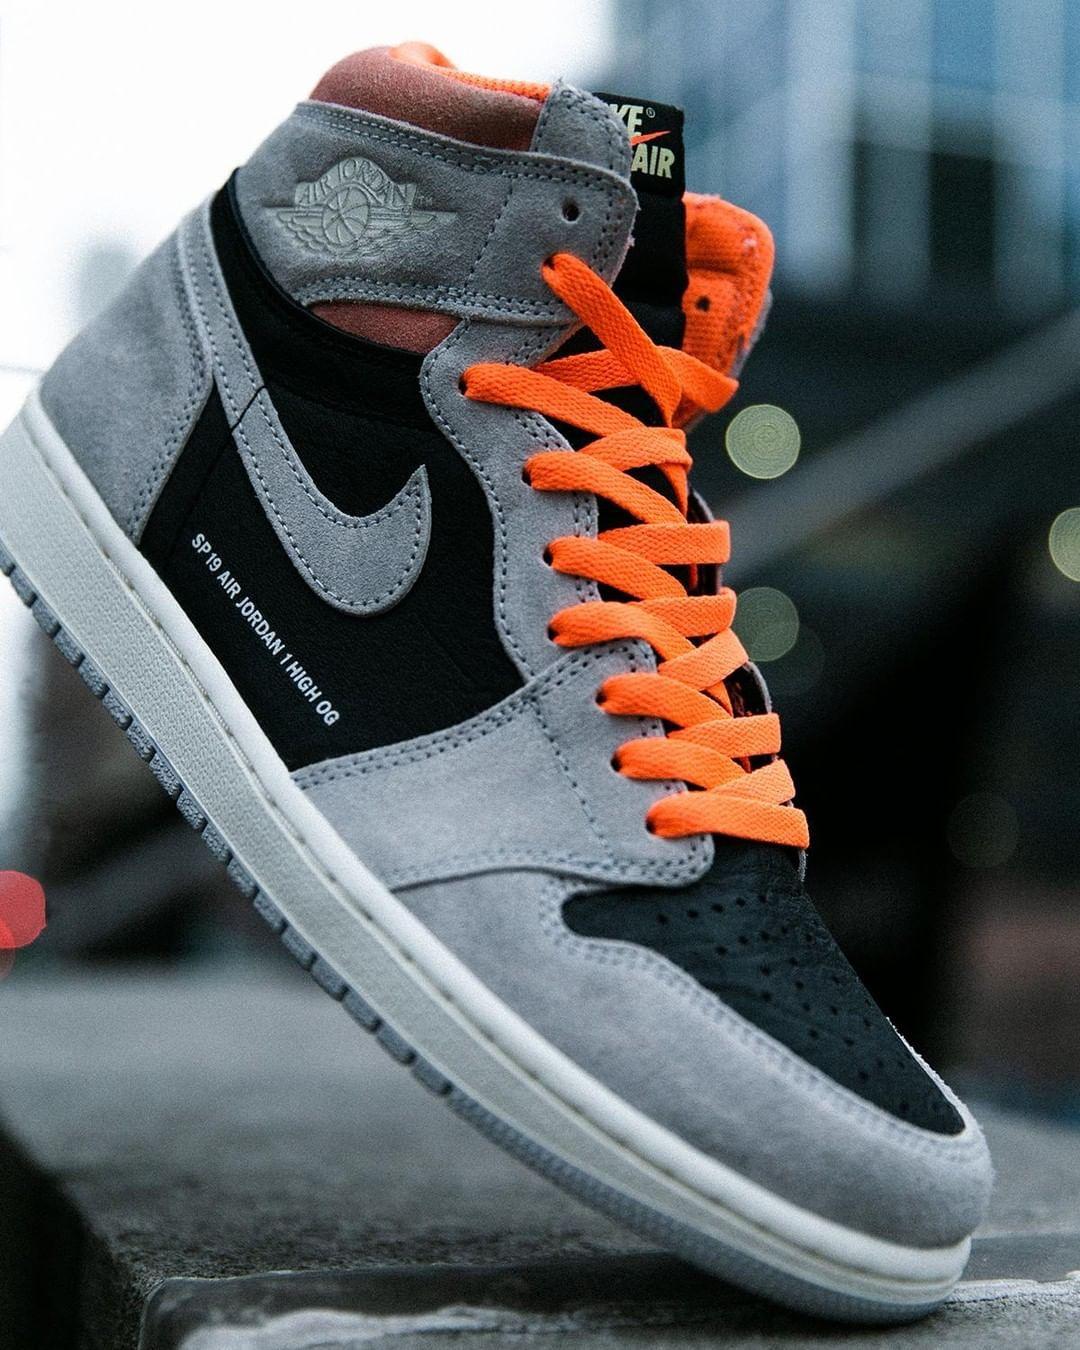 So fresh. #Jordan Retro 1 SS19 'Neutral Gray' Available Now